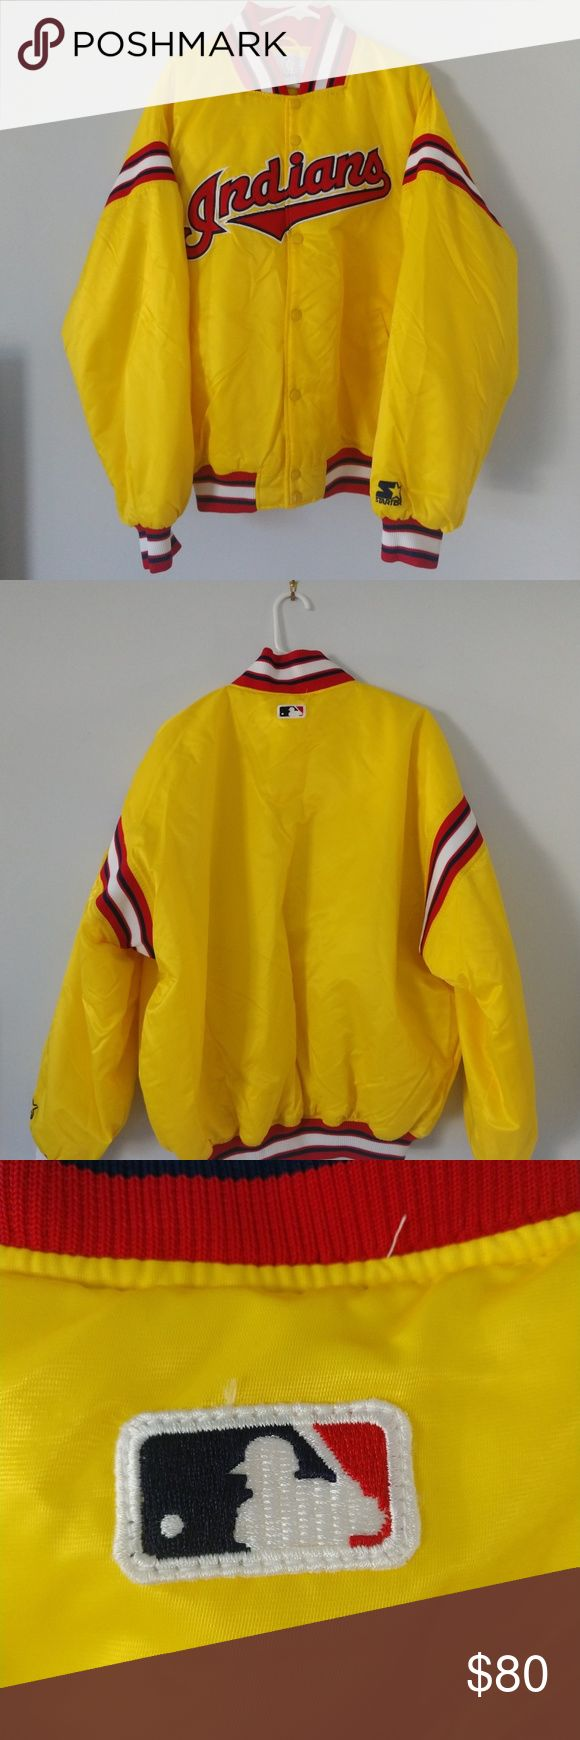 Authentic MLB Cleveland Indians Starter Jacket XL Vintage Late 90s MLB Cleveland…